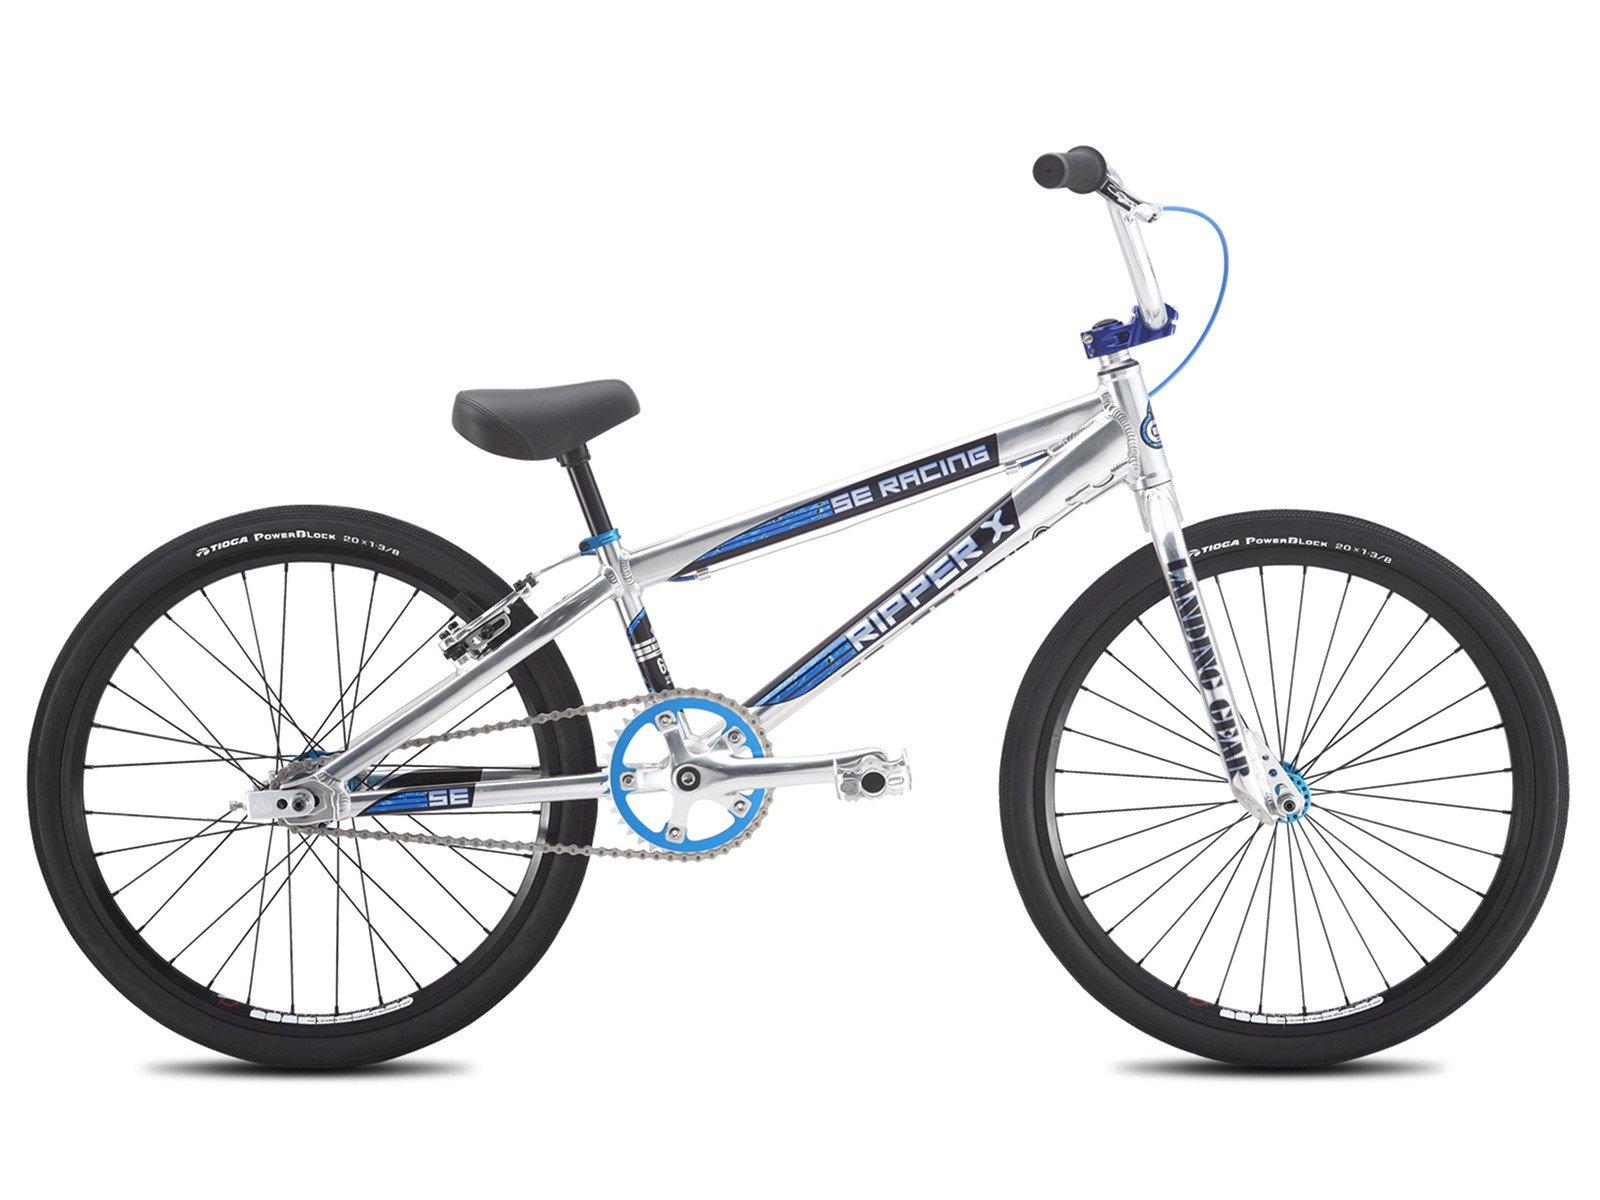 se bikes ripper expert 2016 bmx race bike high polish. Black Bedroom Furniture Sets. Home Design Ideas